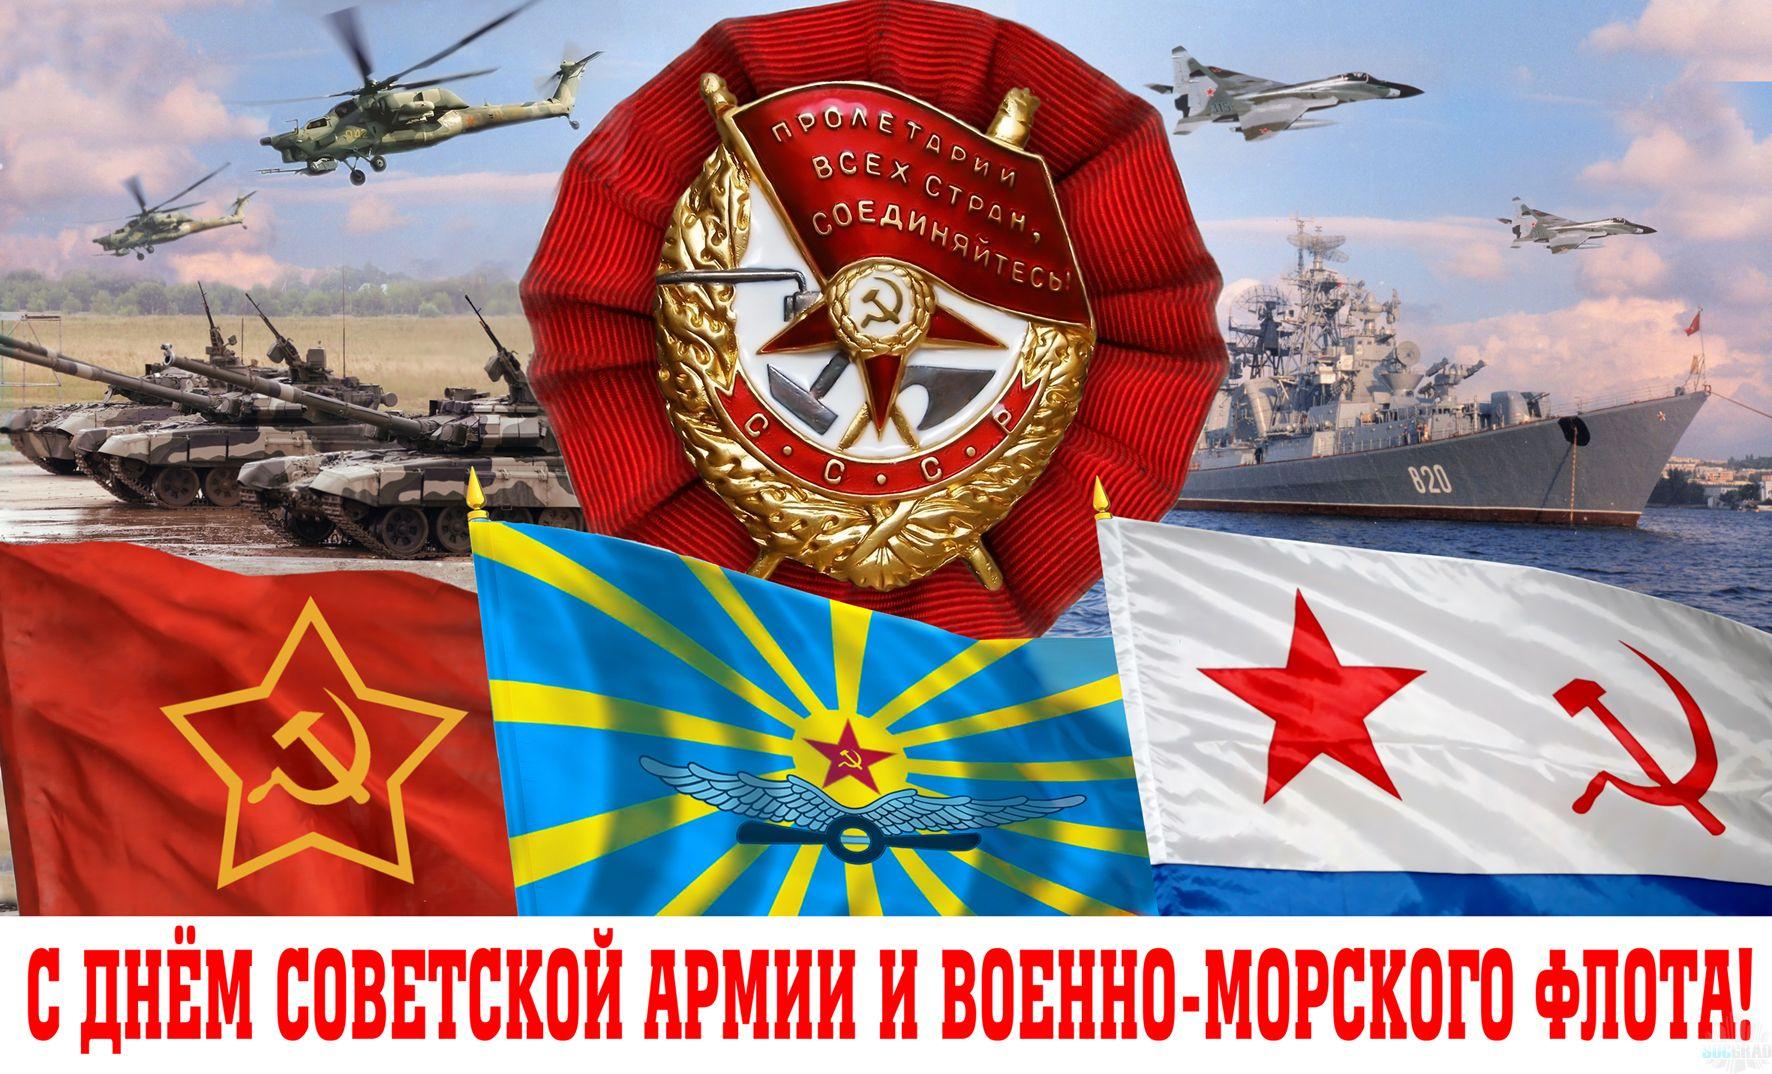 http://sh.uploads.ru/t6QVW.jpg